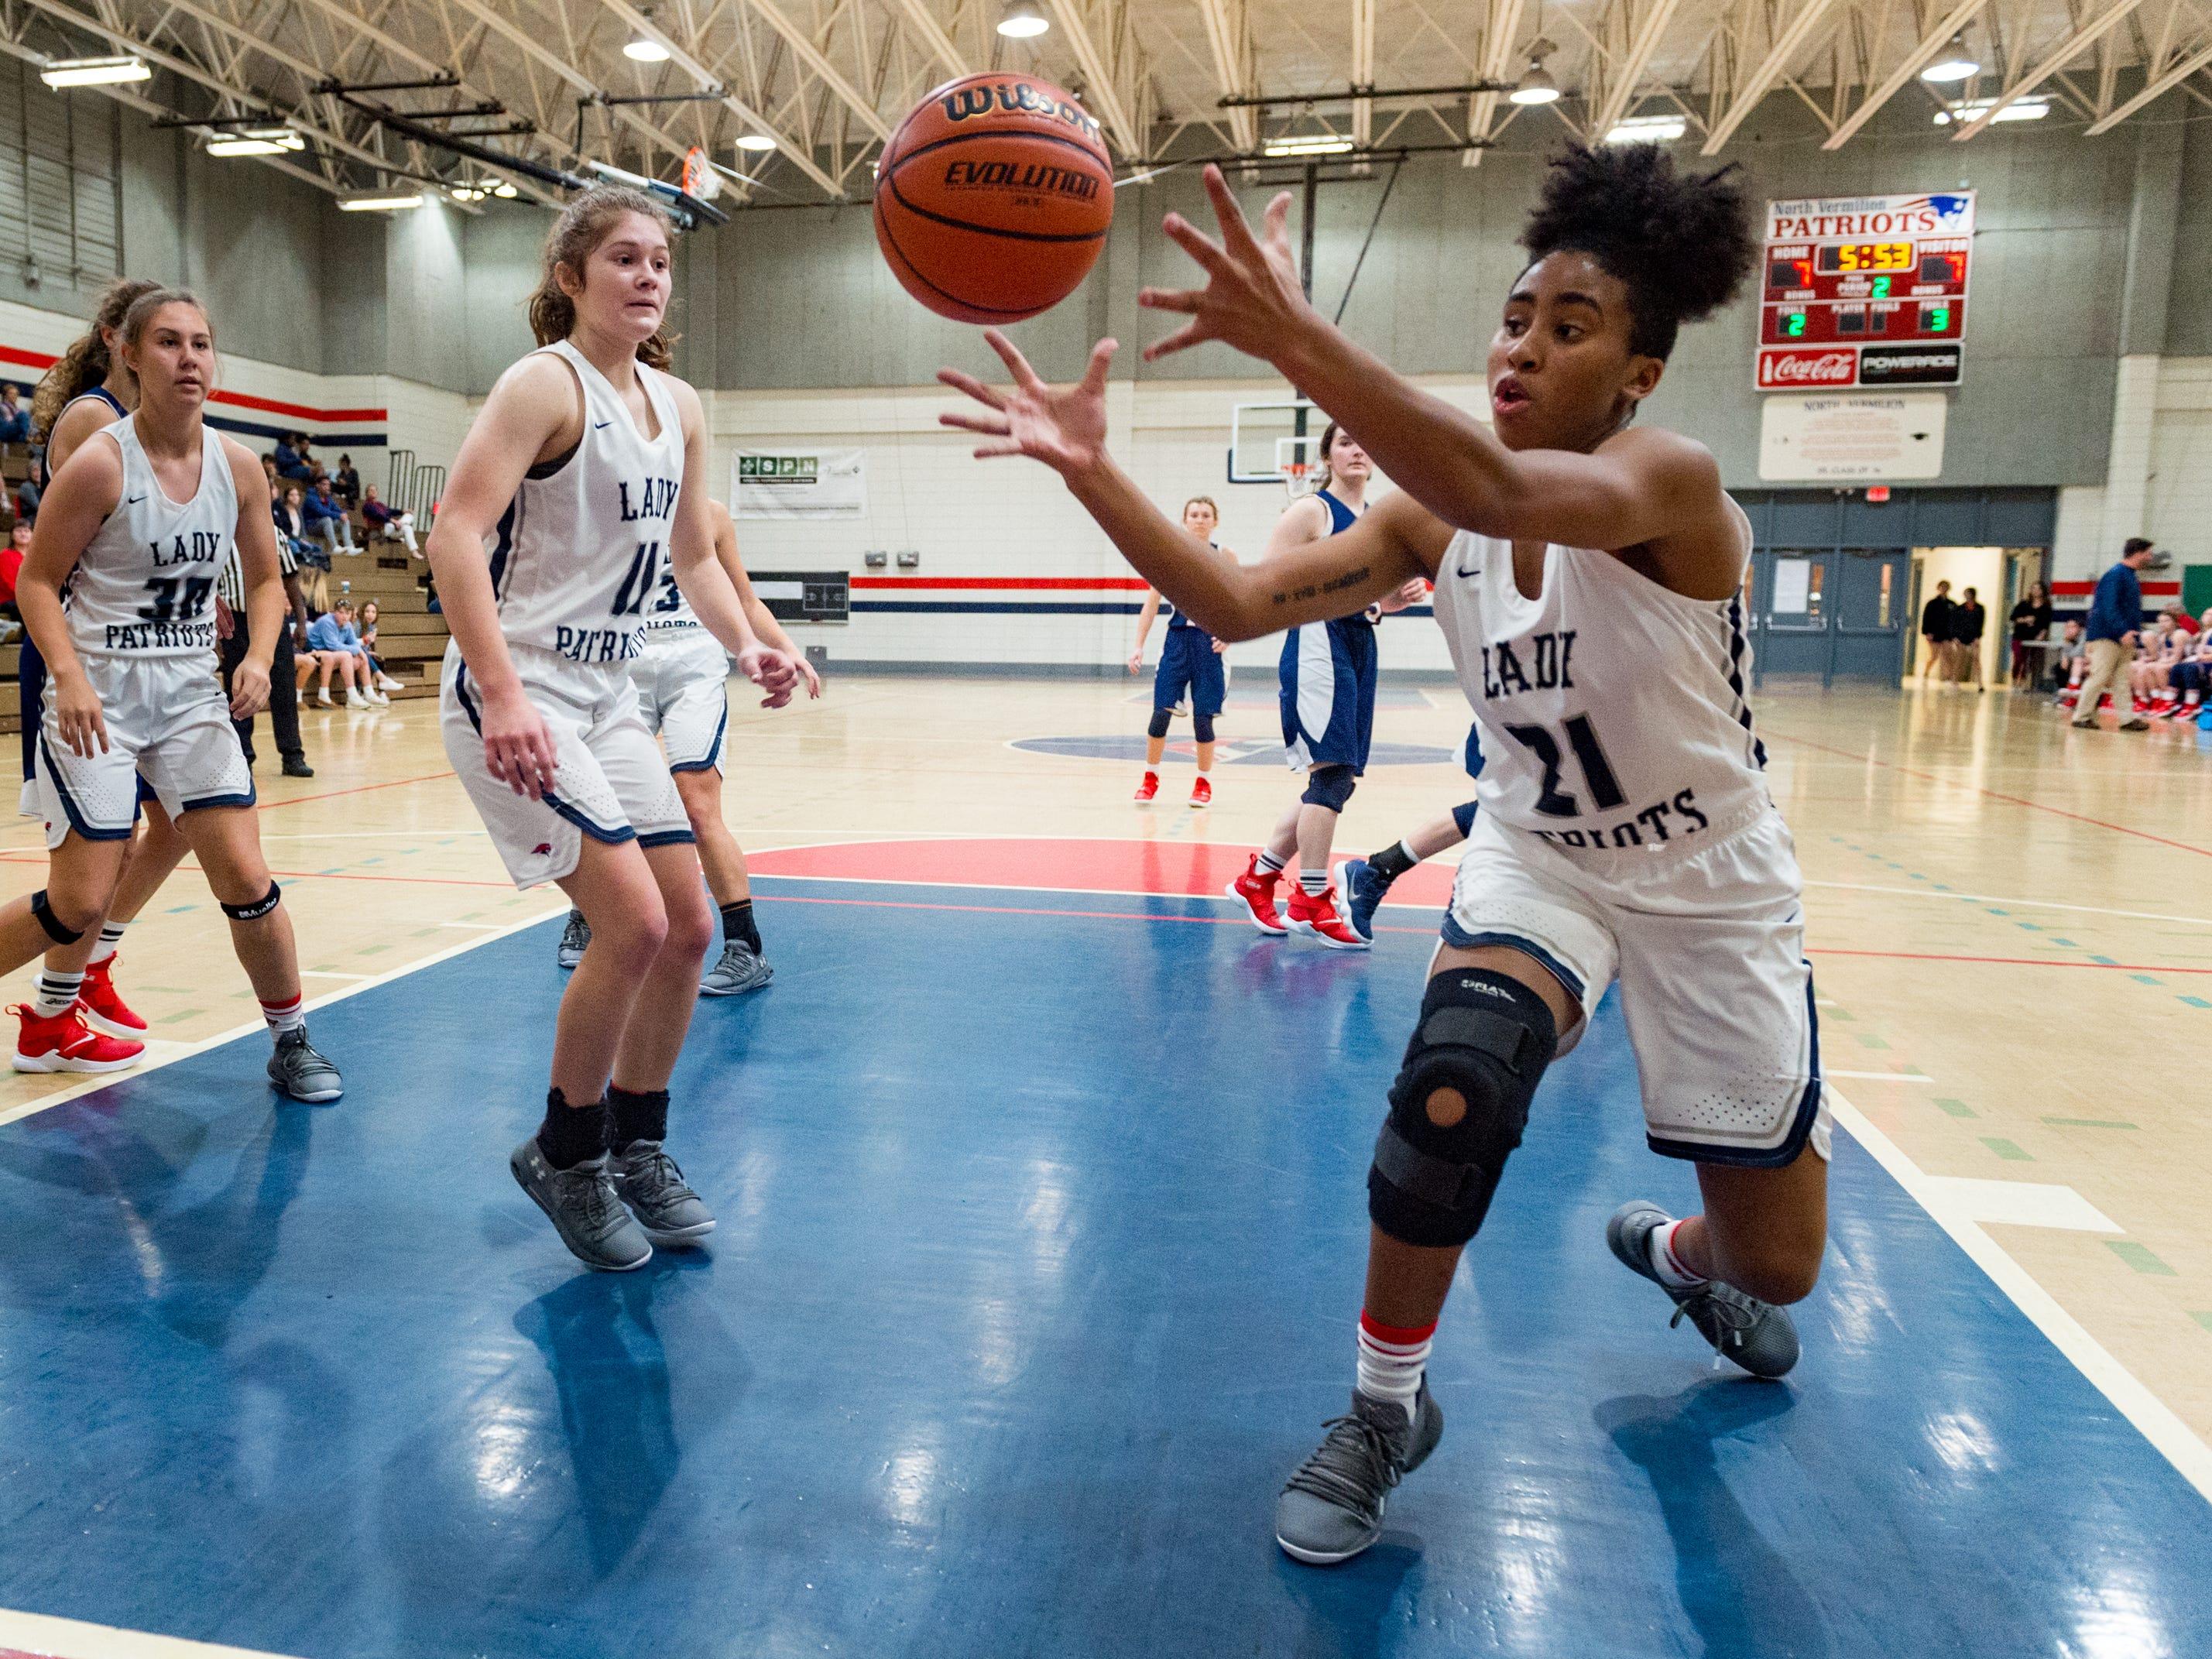 Gabbie Bessard gets the rebound as Notre Dame and North Vermillion face off in Girls Basketball Tournament at North Vermillion High School. Tuesday, Nov. 20, 2018.